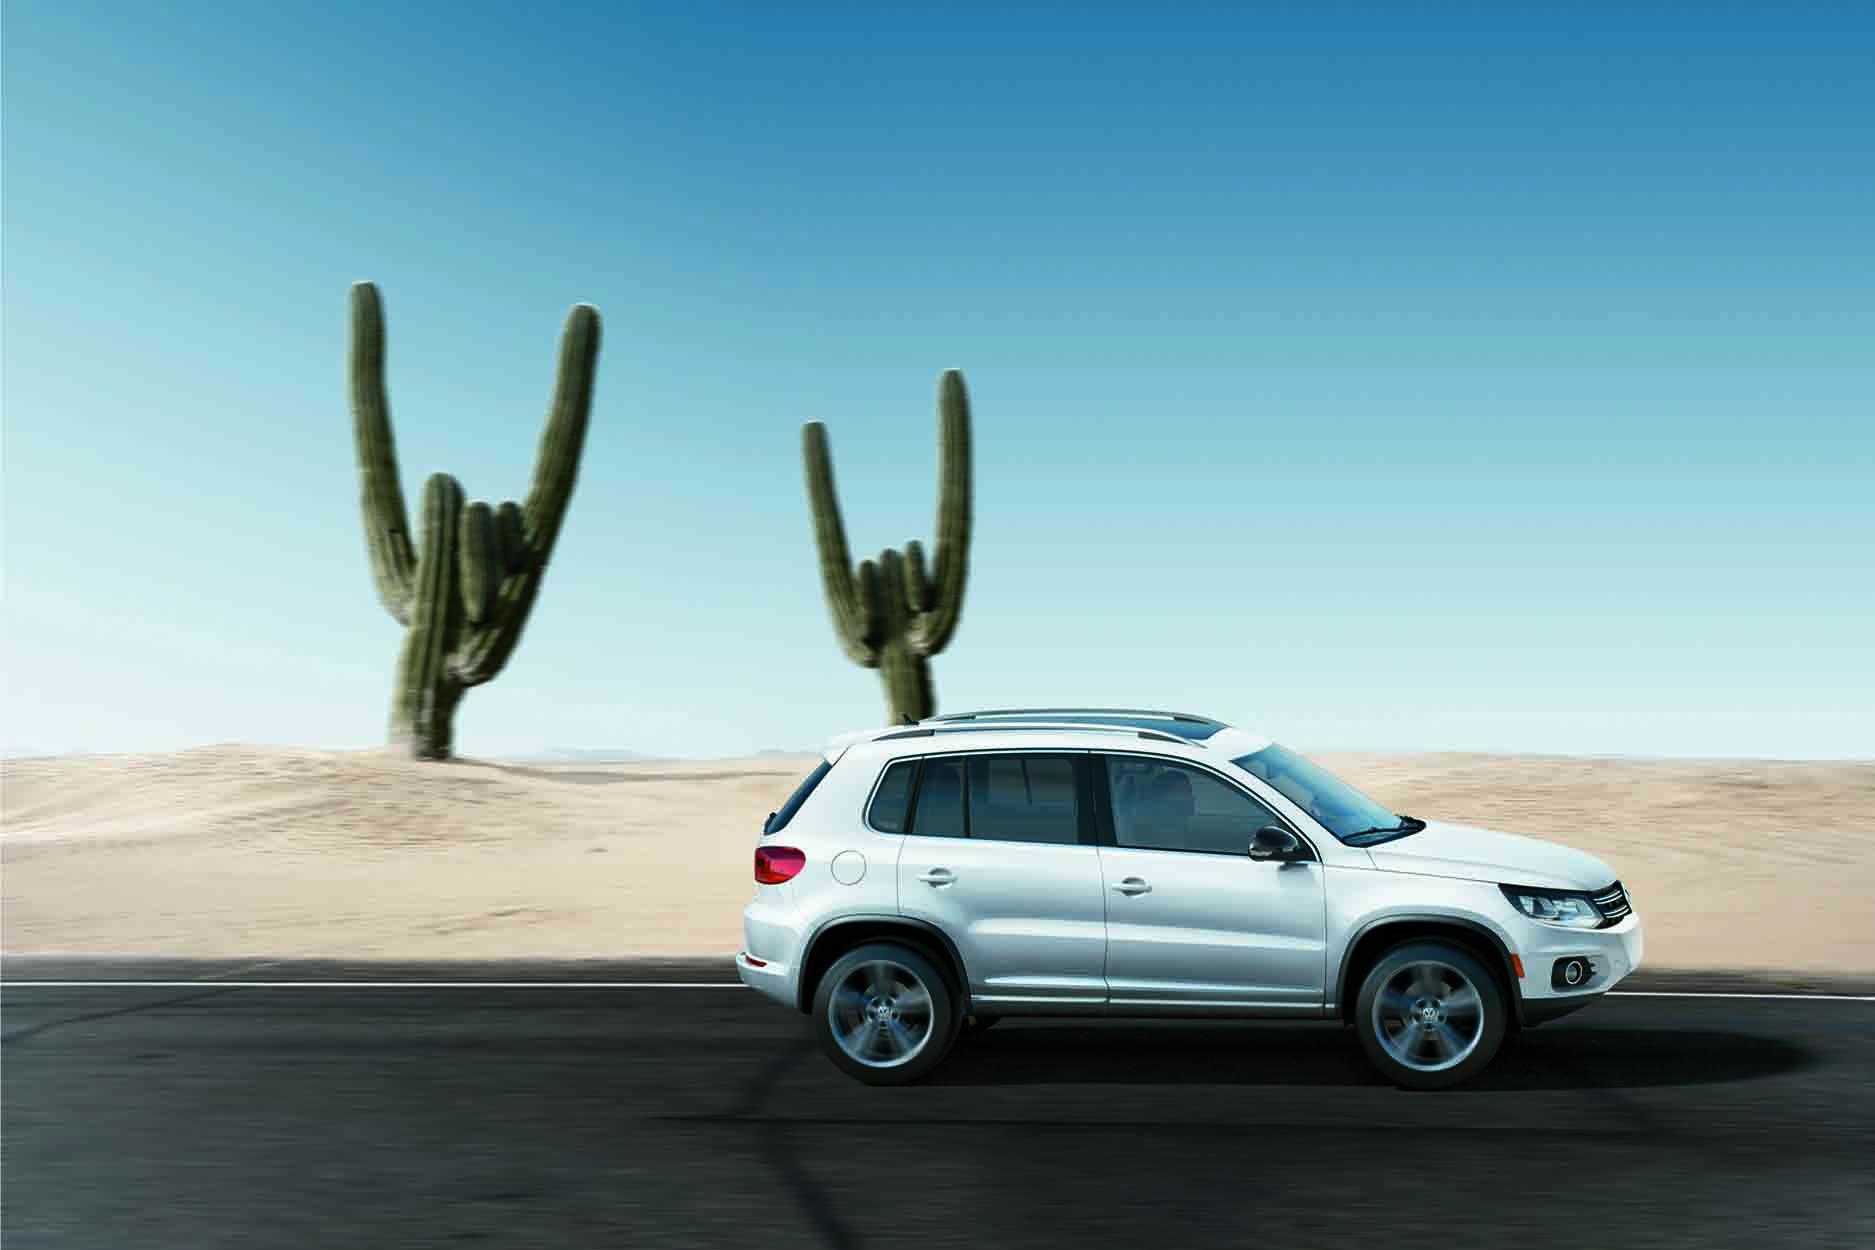 Vw San Diego >> Volkswagen Suvs Near San Diego Ca South Bay Vw